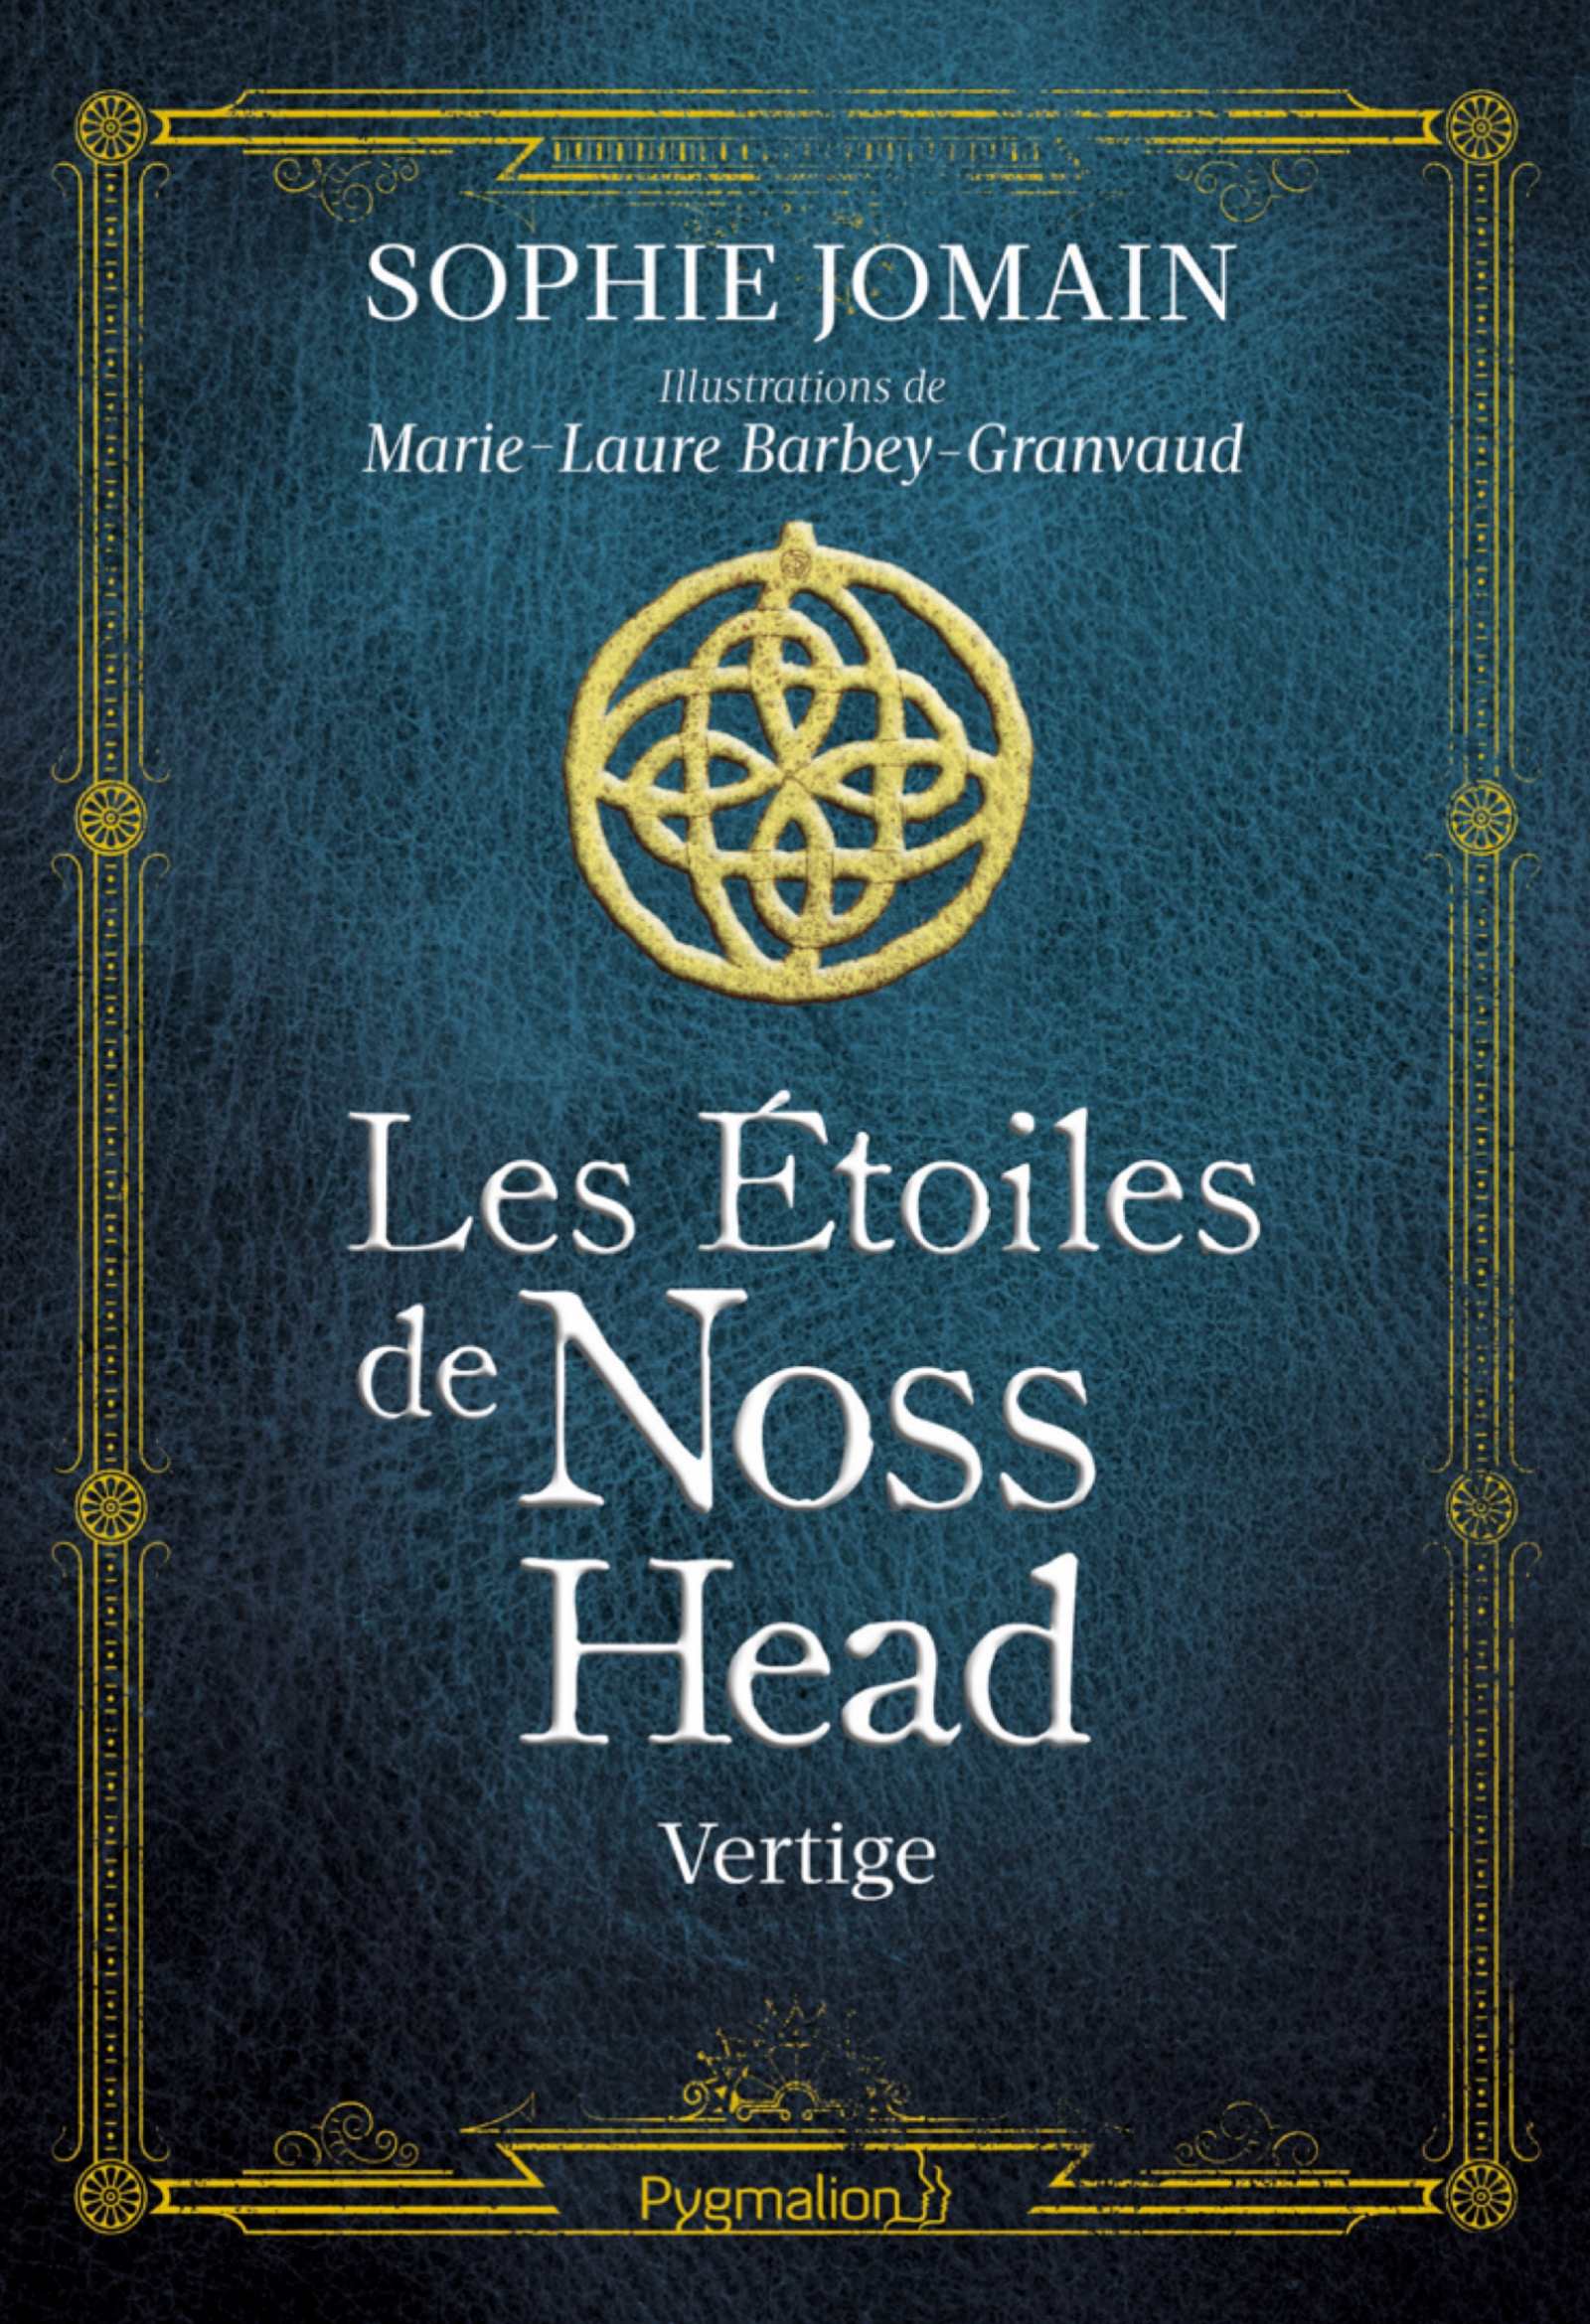 les-etoiles-de-noss-head-tome-1-vertige-edition-illustree-828754.jpg